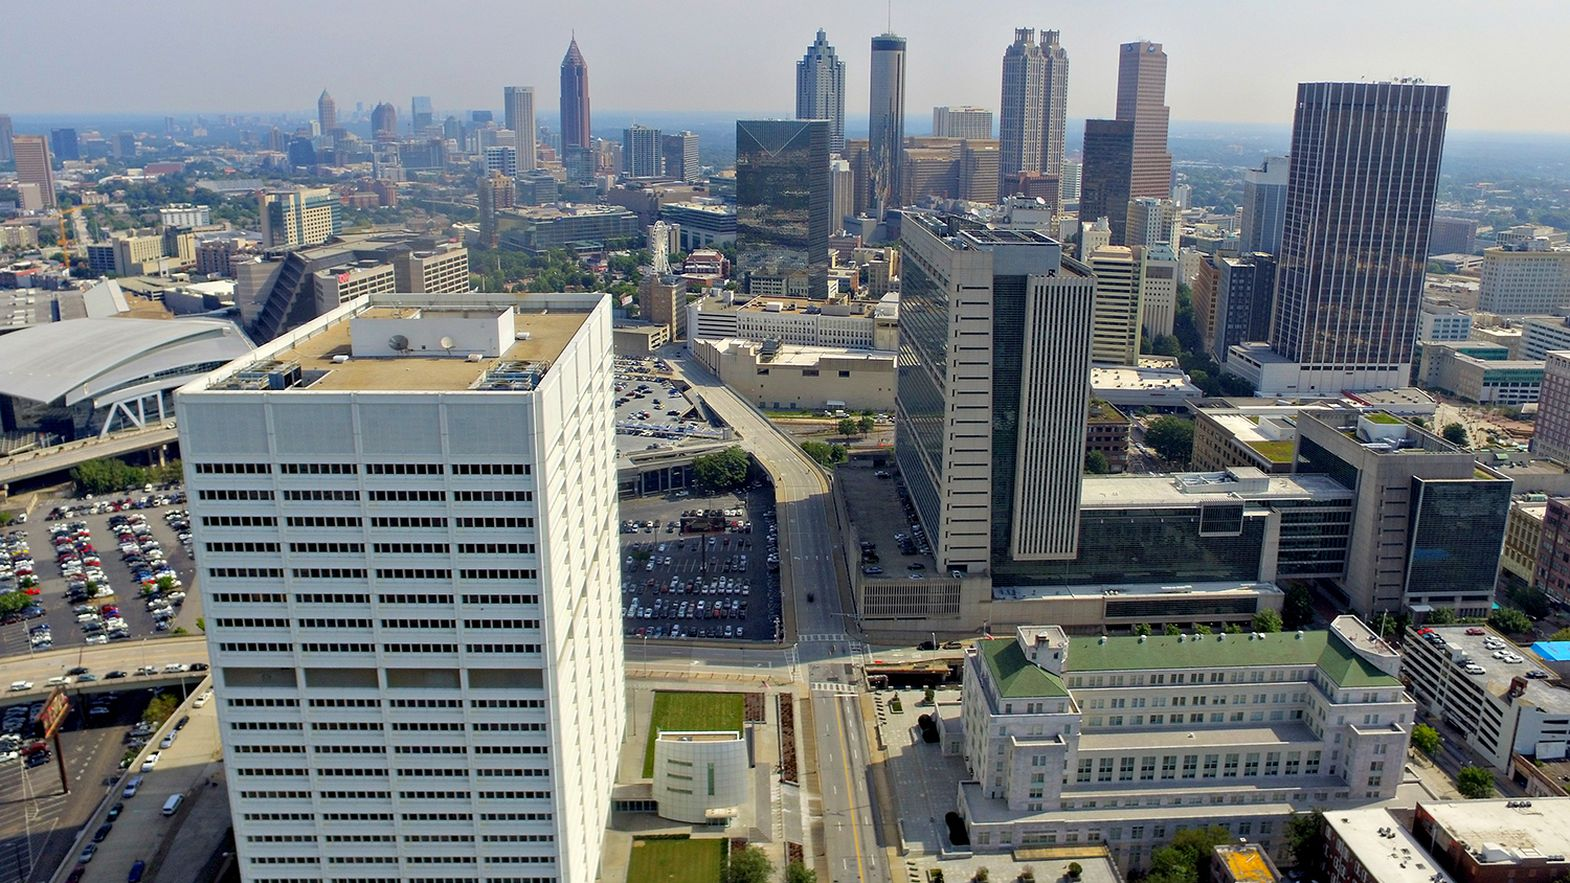 A broad drone view of Atlanta's skyline.